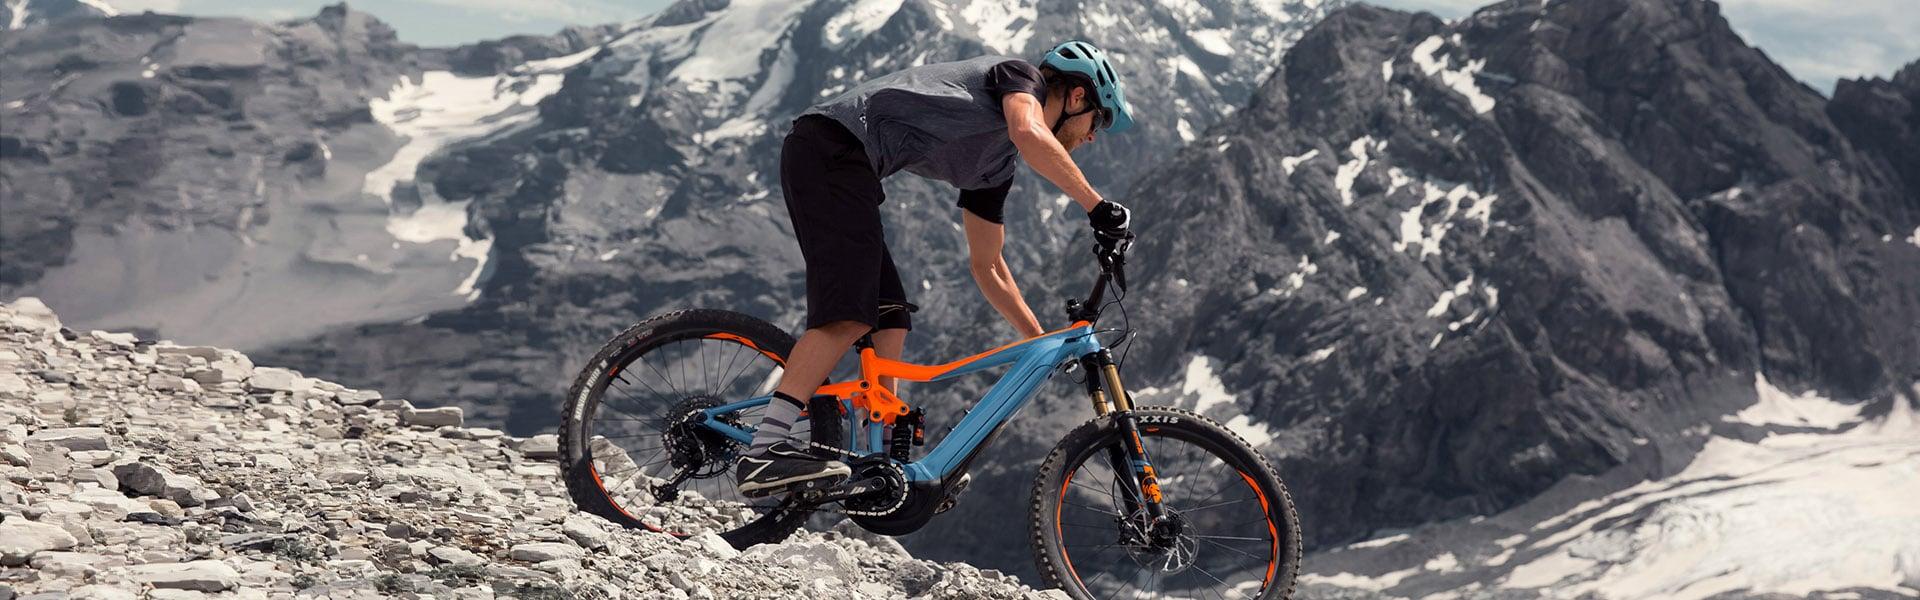 New Giant Trance E+ Hybrid E-bike